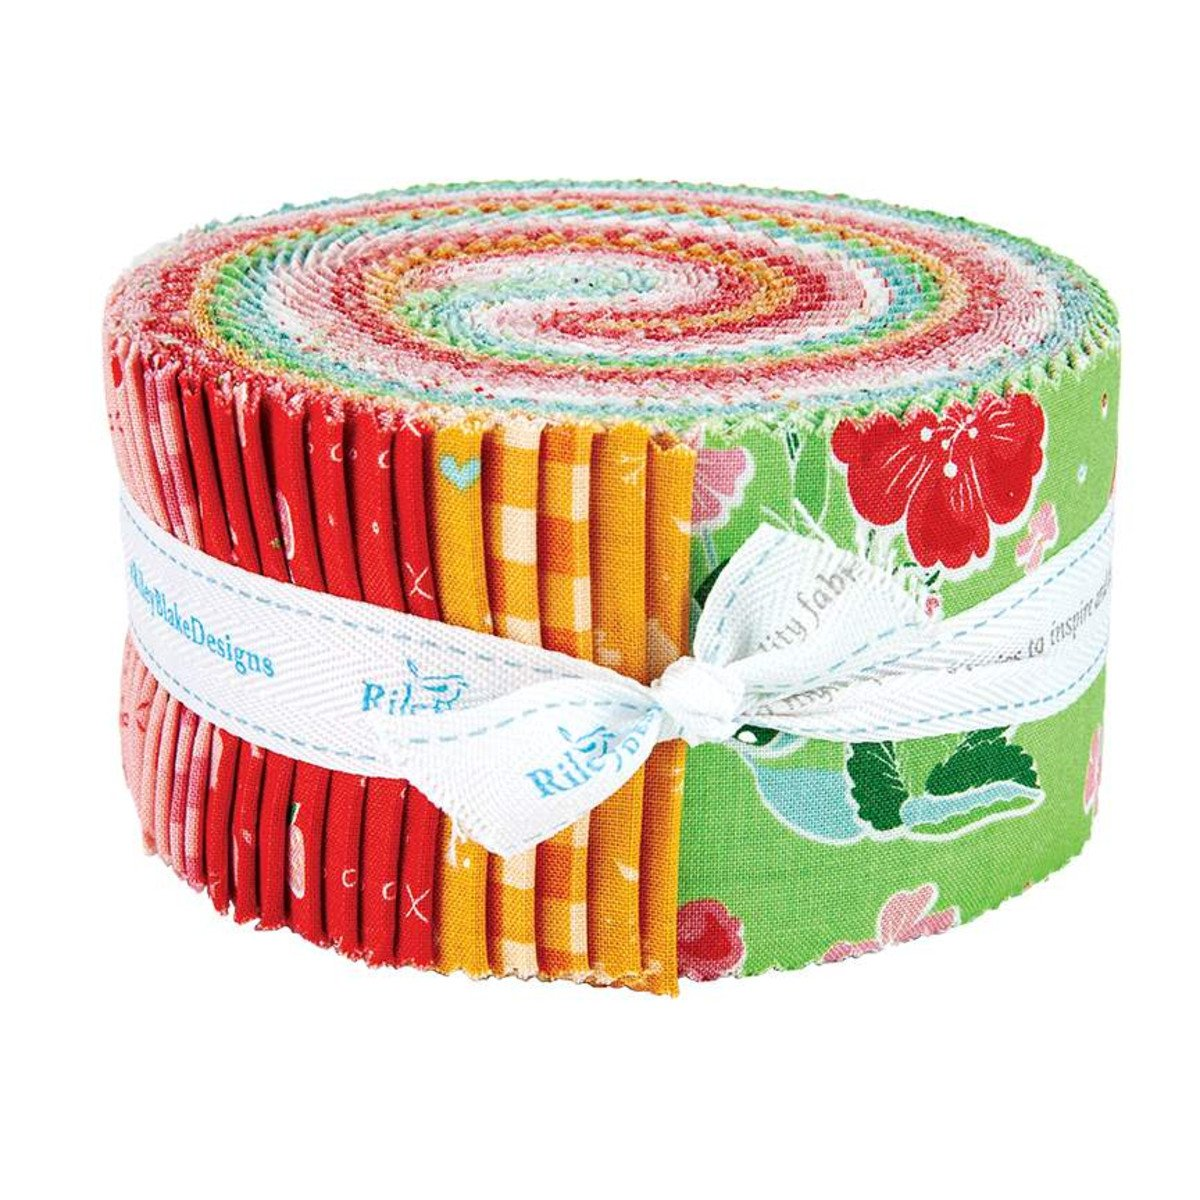 Strawberry Honey 2-1/2in Strips, 40pcs